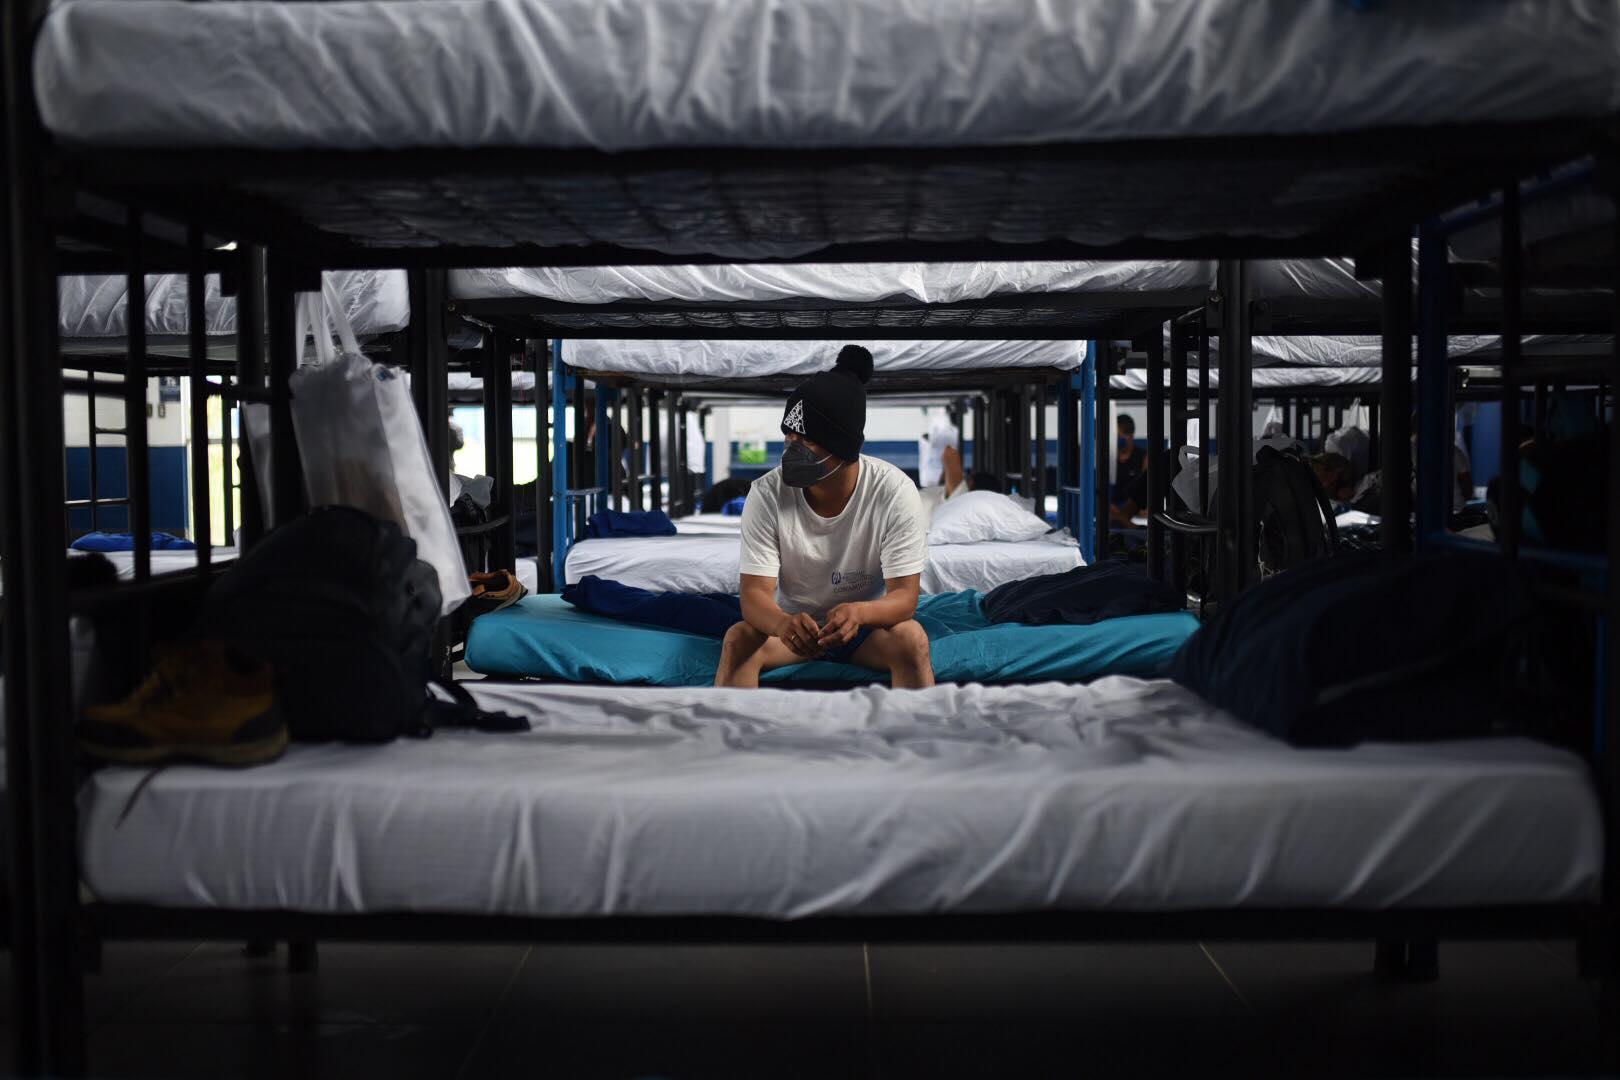 presidente Alejandro Giammattei visita albergue para migrantes retornados